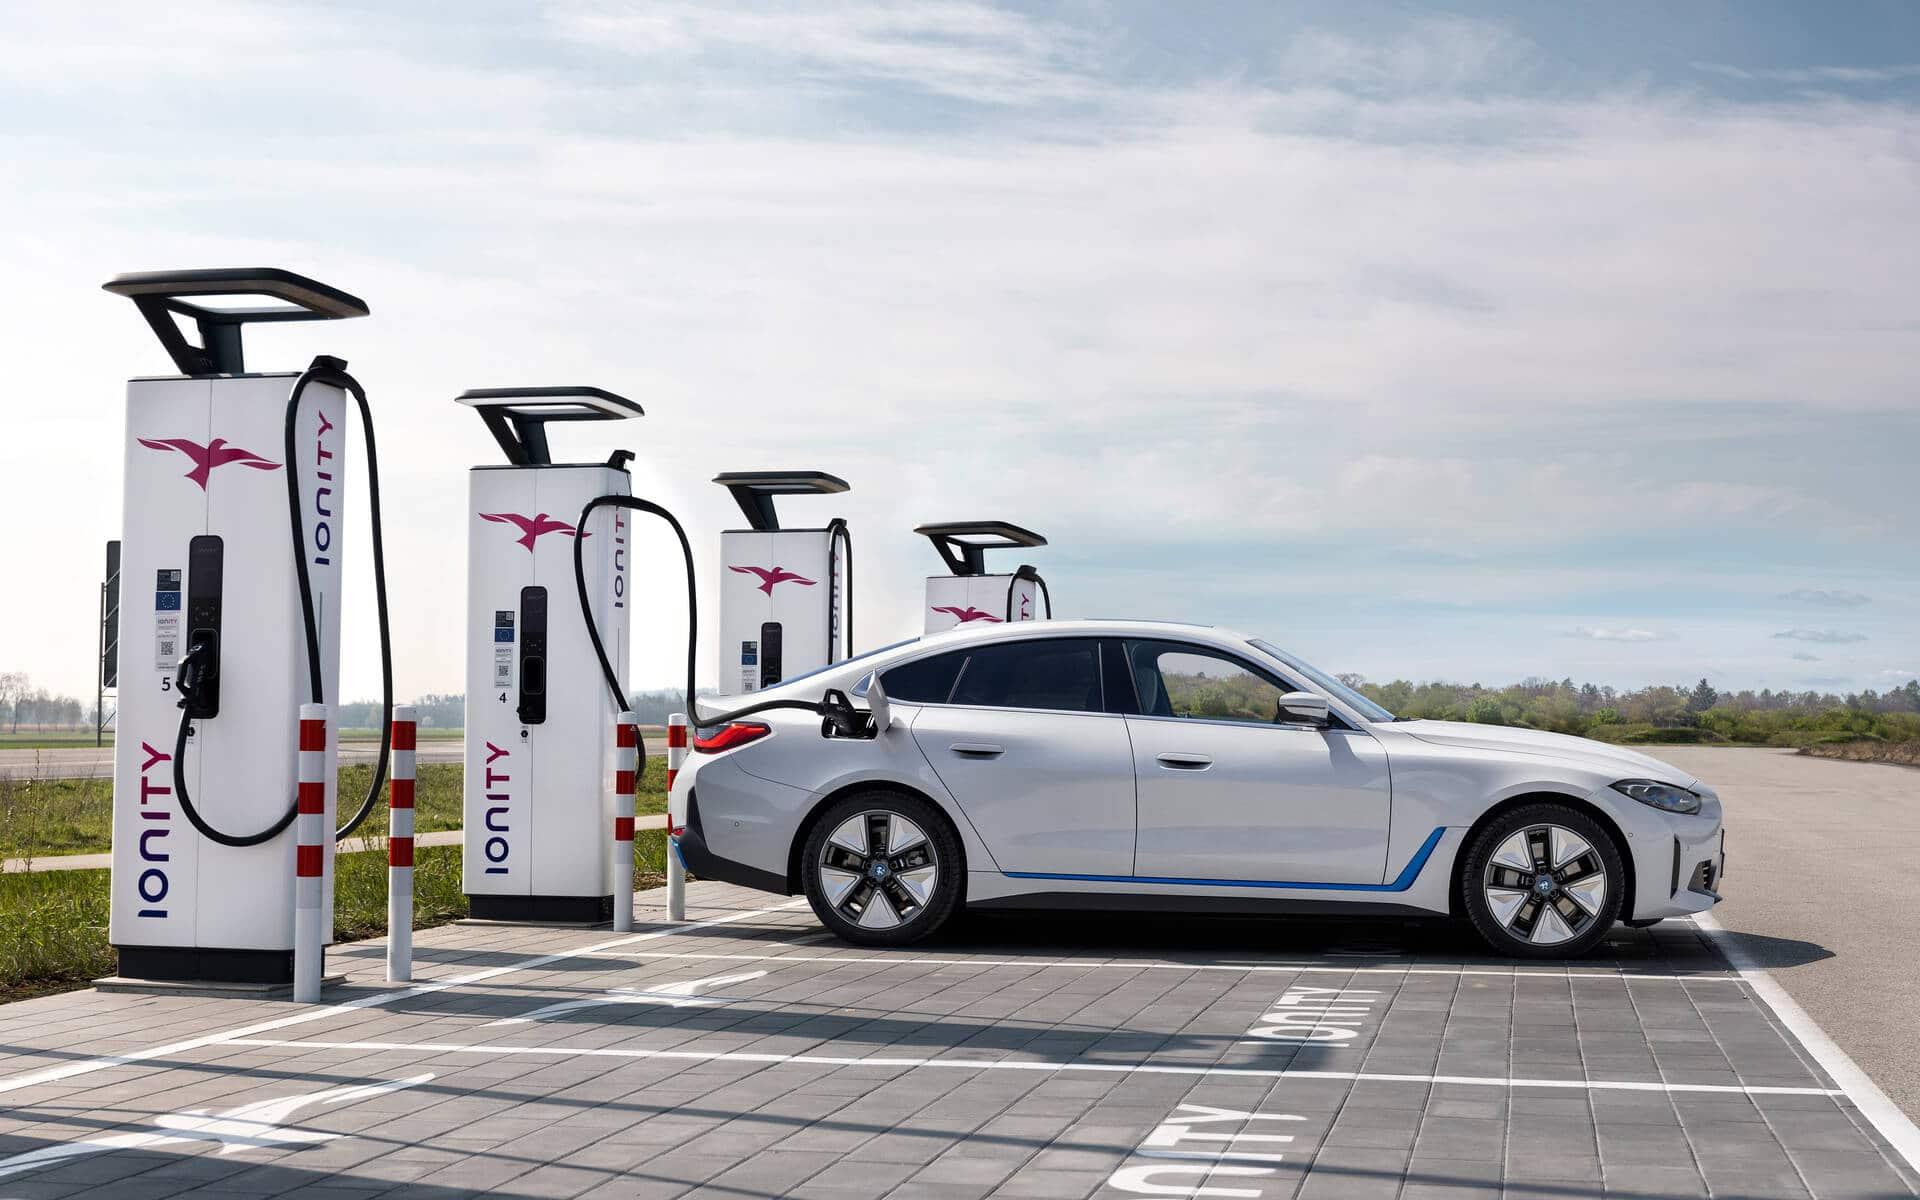 L'application « My BMW » permet de repérer les bornes. Source: www.guideauto.ca